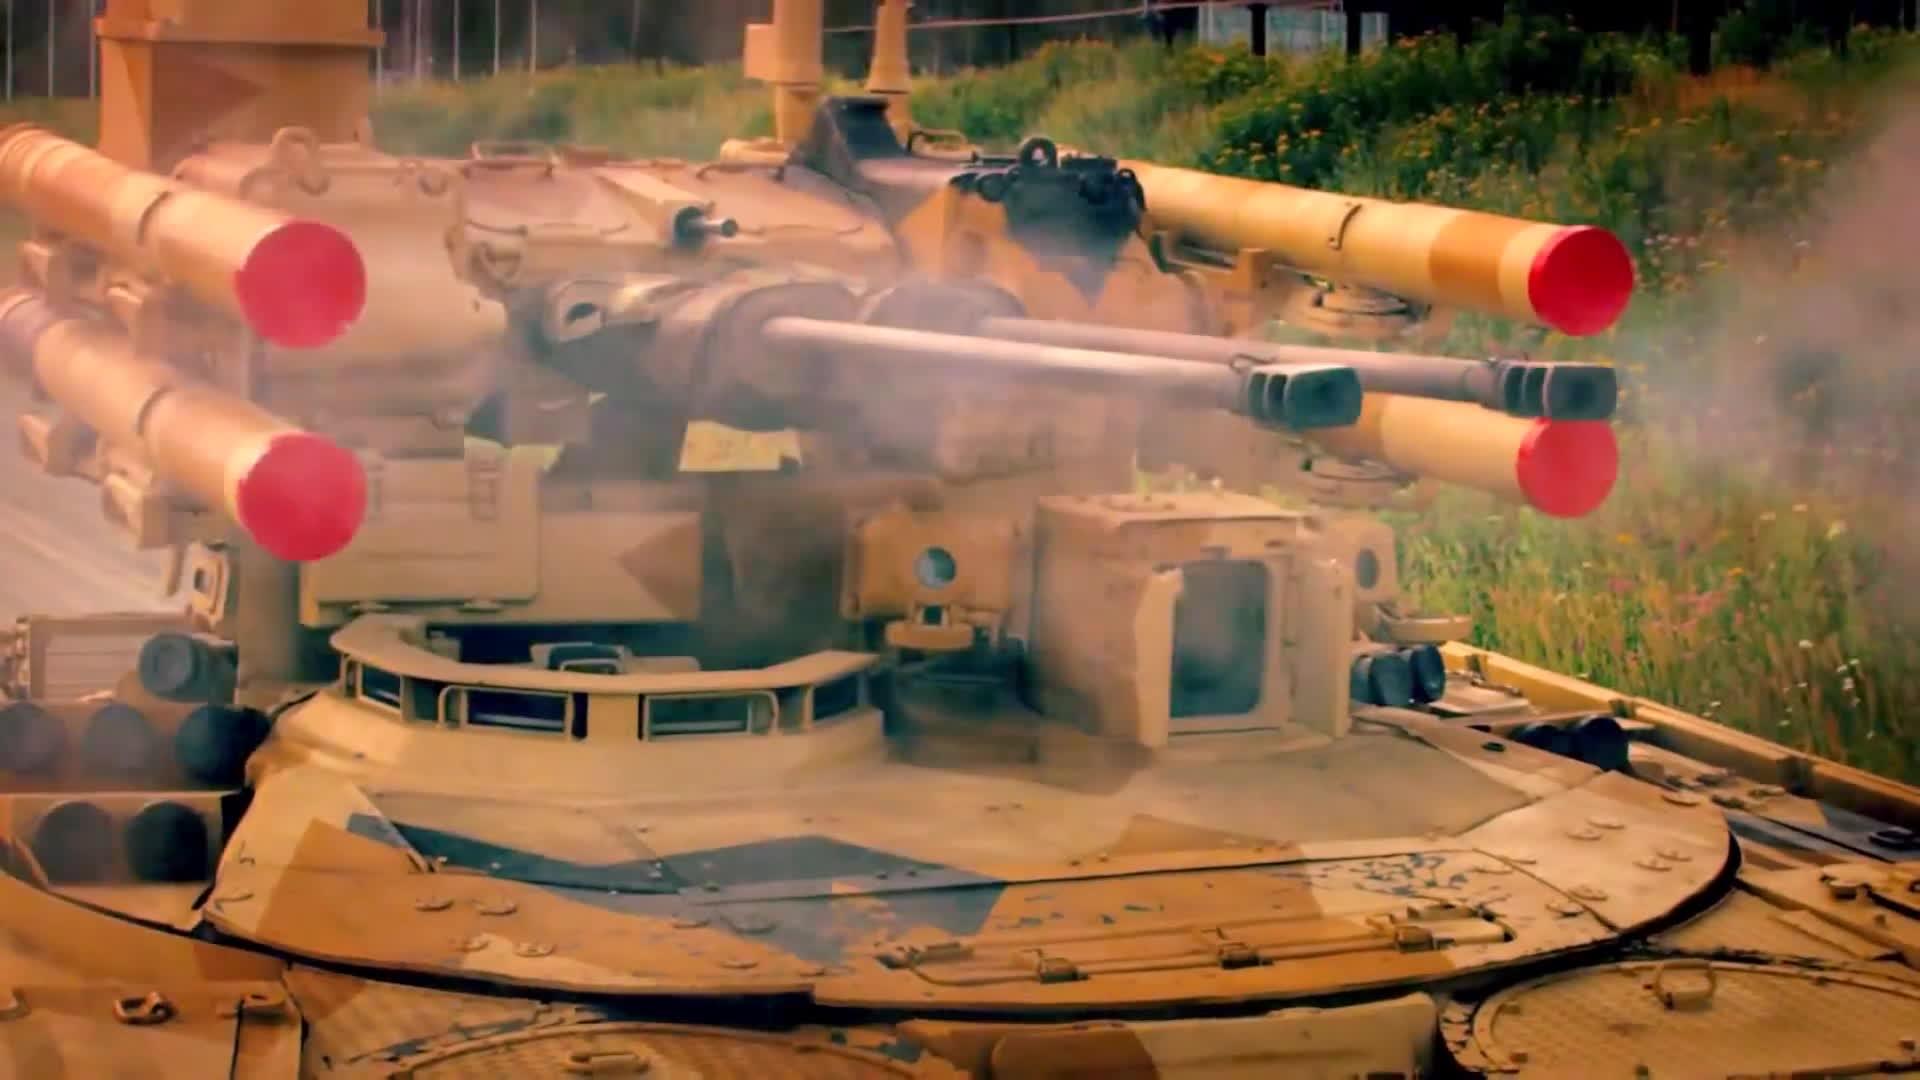 military, UralVagon Zavod - BMPT Terminator Tank Support Fighting Vehicle RAE 2013 [1080p] GIFs